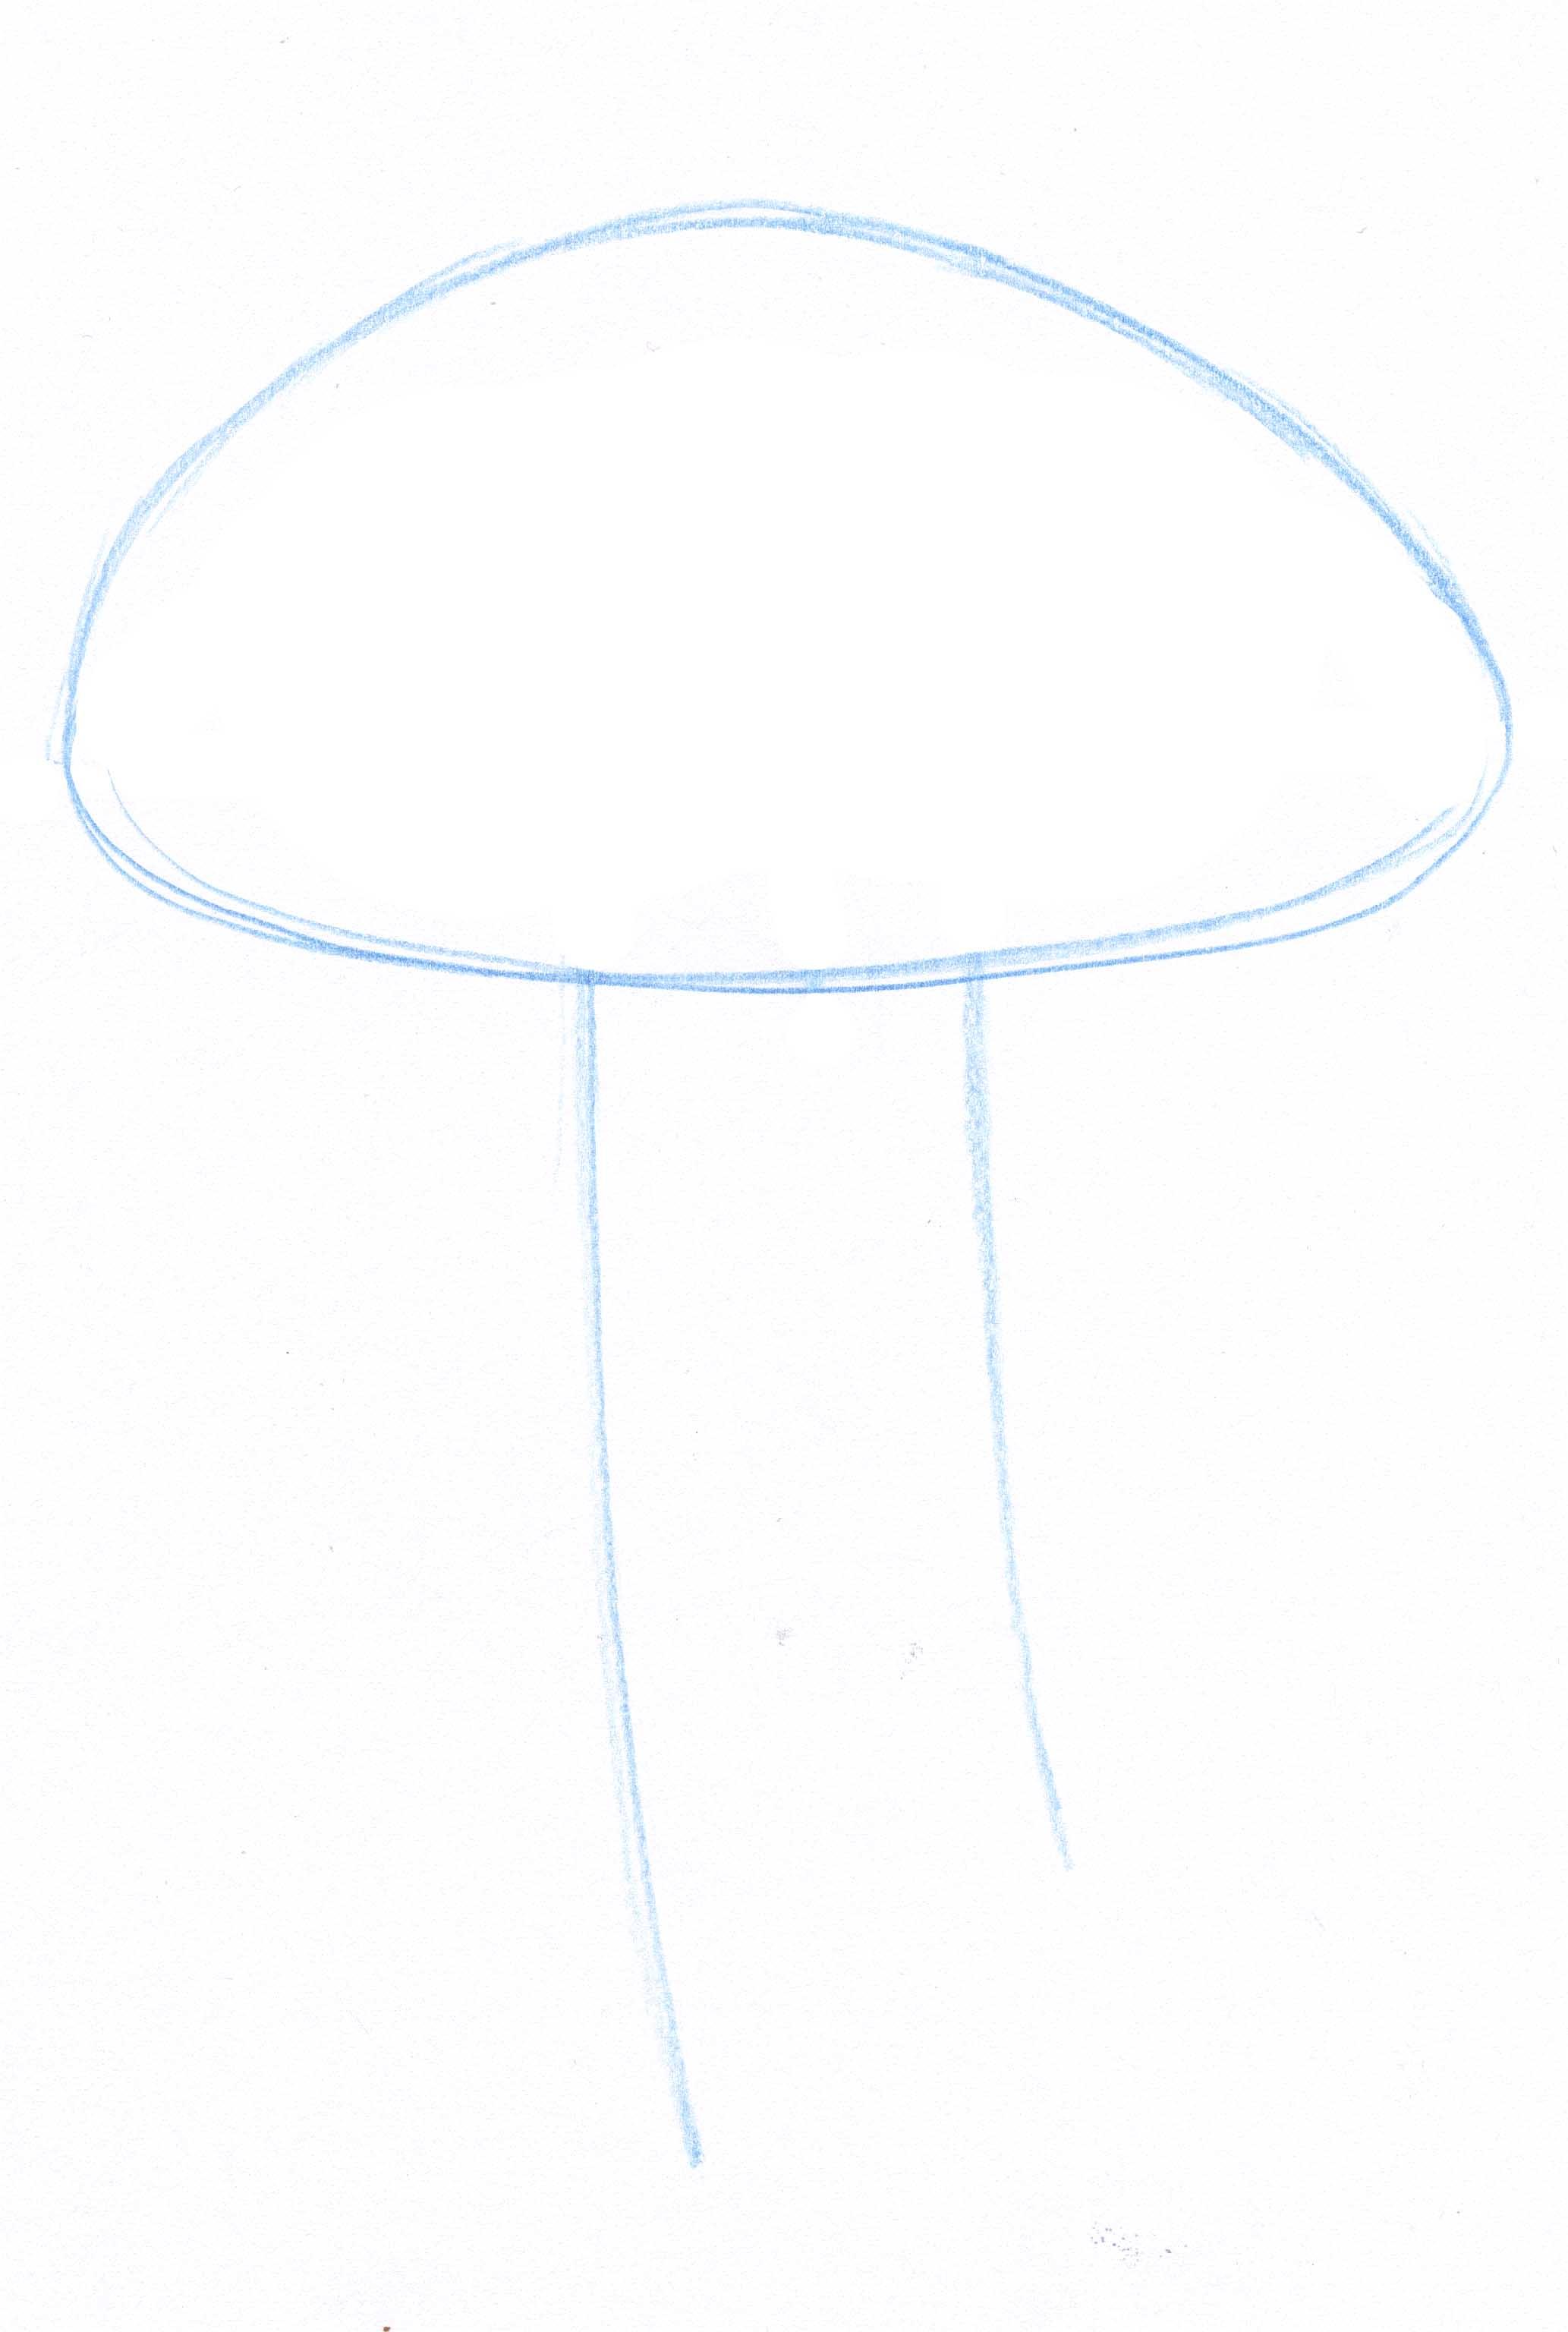 Drawing Lines Visual Basic : Top view john muir laws